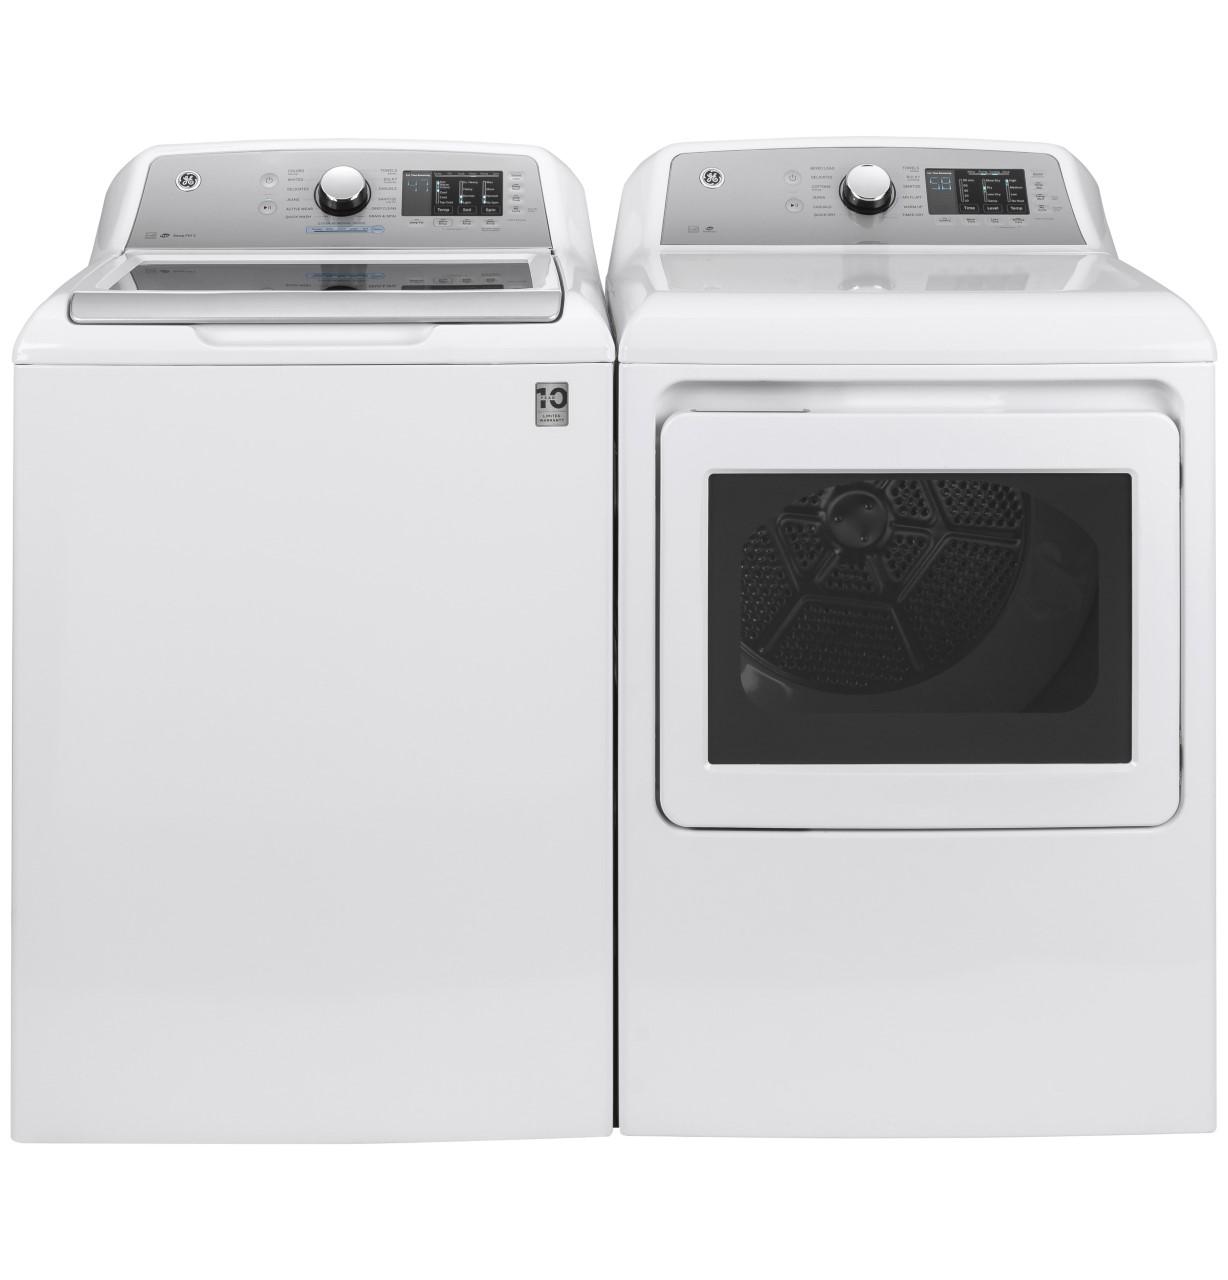 GTW725-GTD72 GE TL Laundry Set